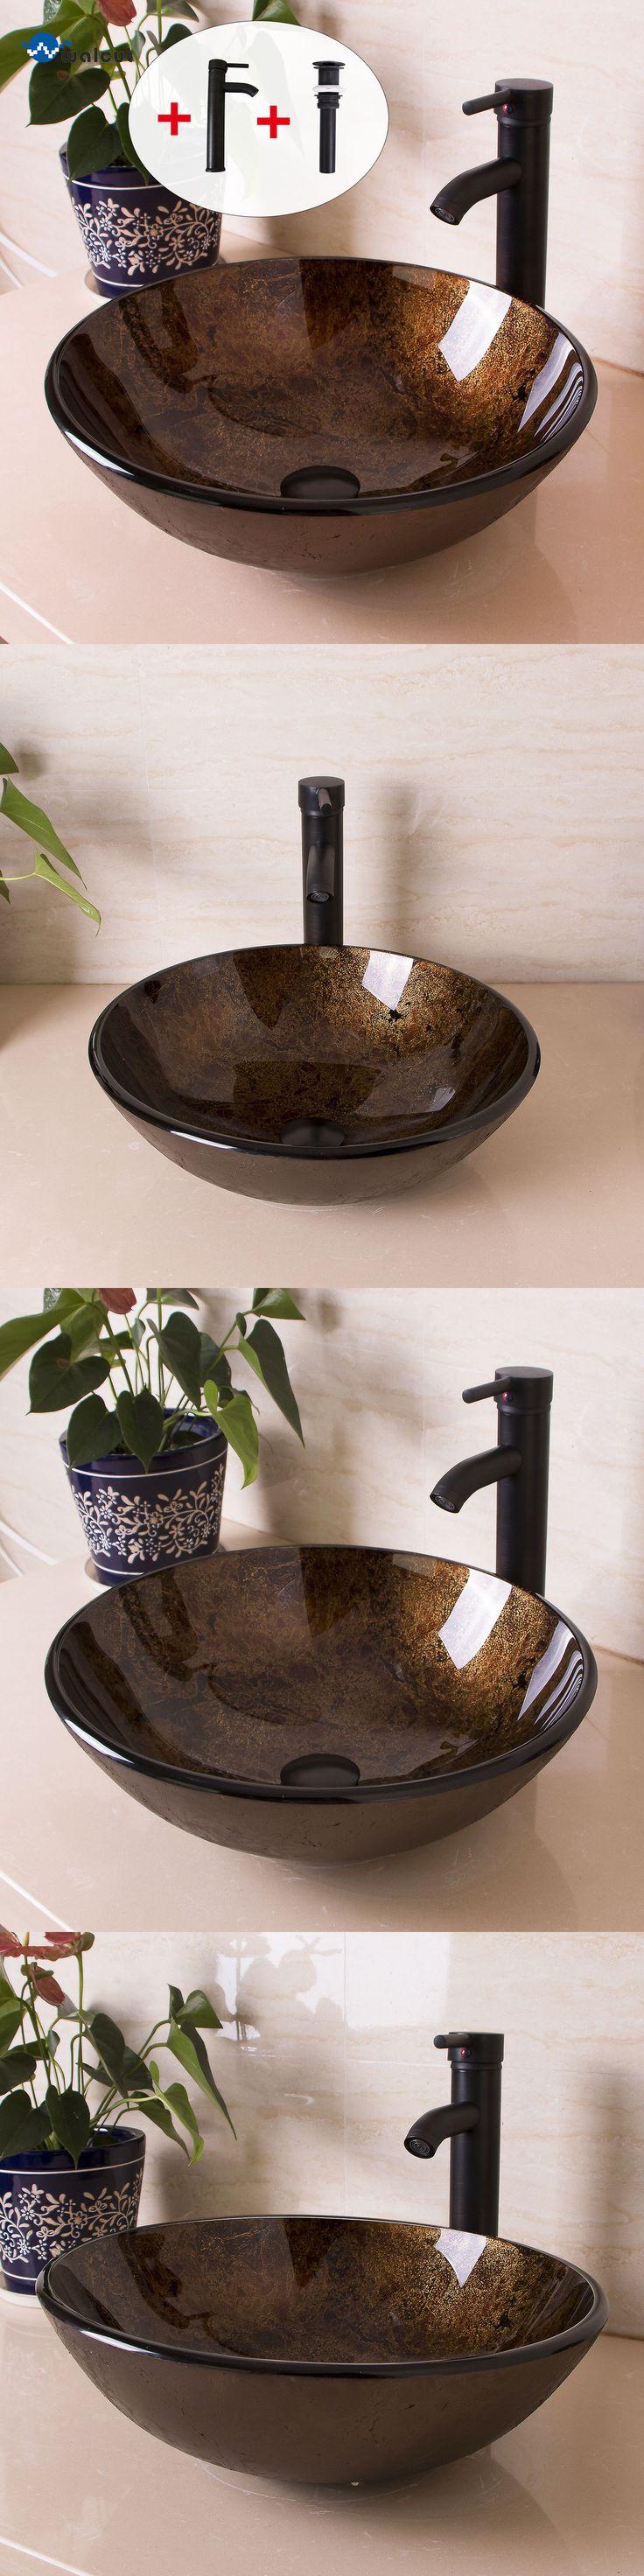 best 20+ oil rubbed bronze faucet ideas on pinterest | cream open